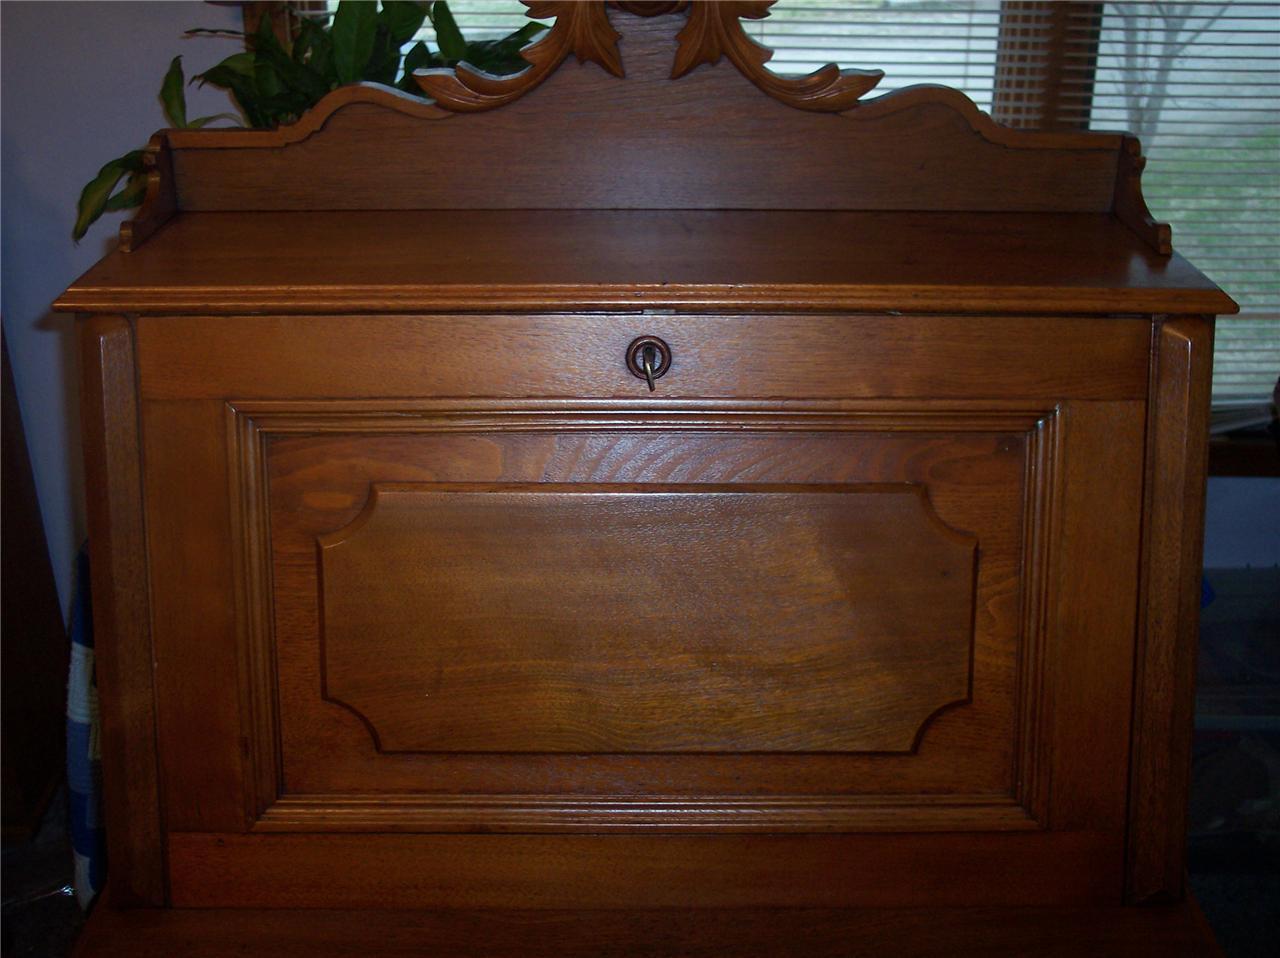 Walnut Carved Drop Front Desk w/ Birdseye Maple Accents